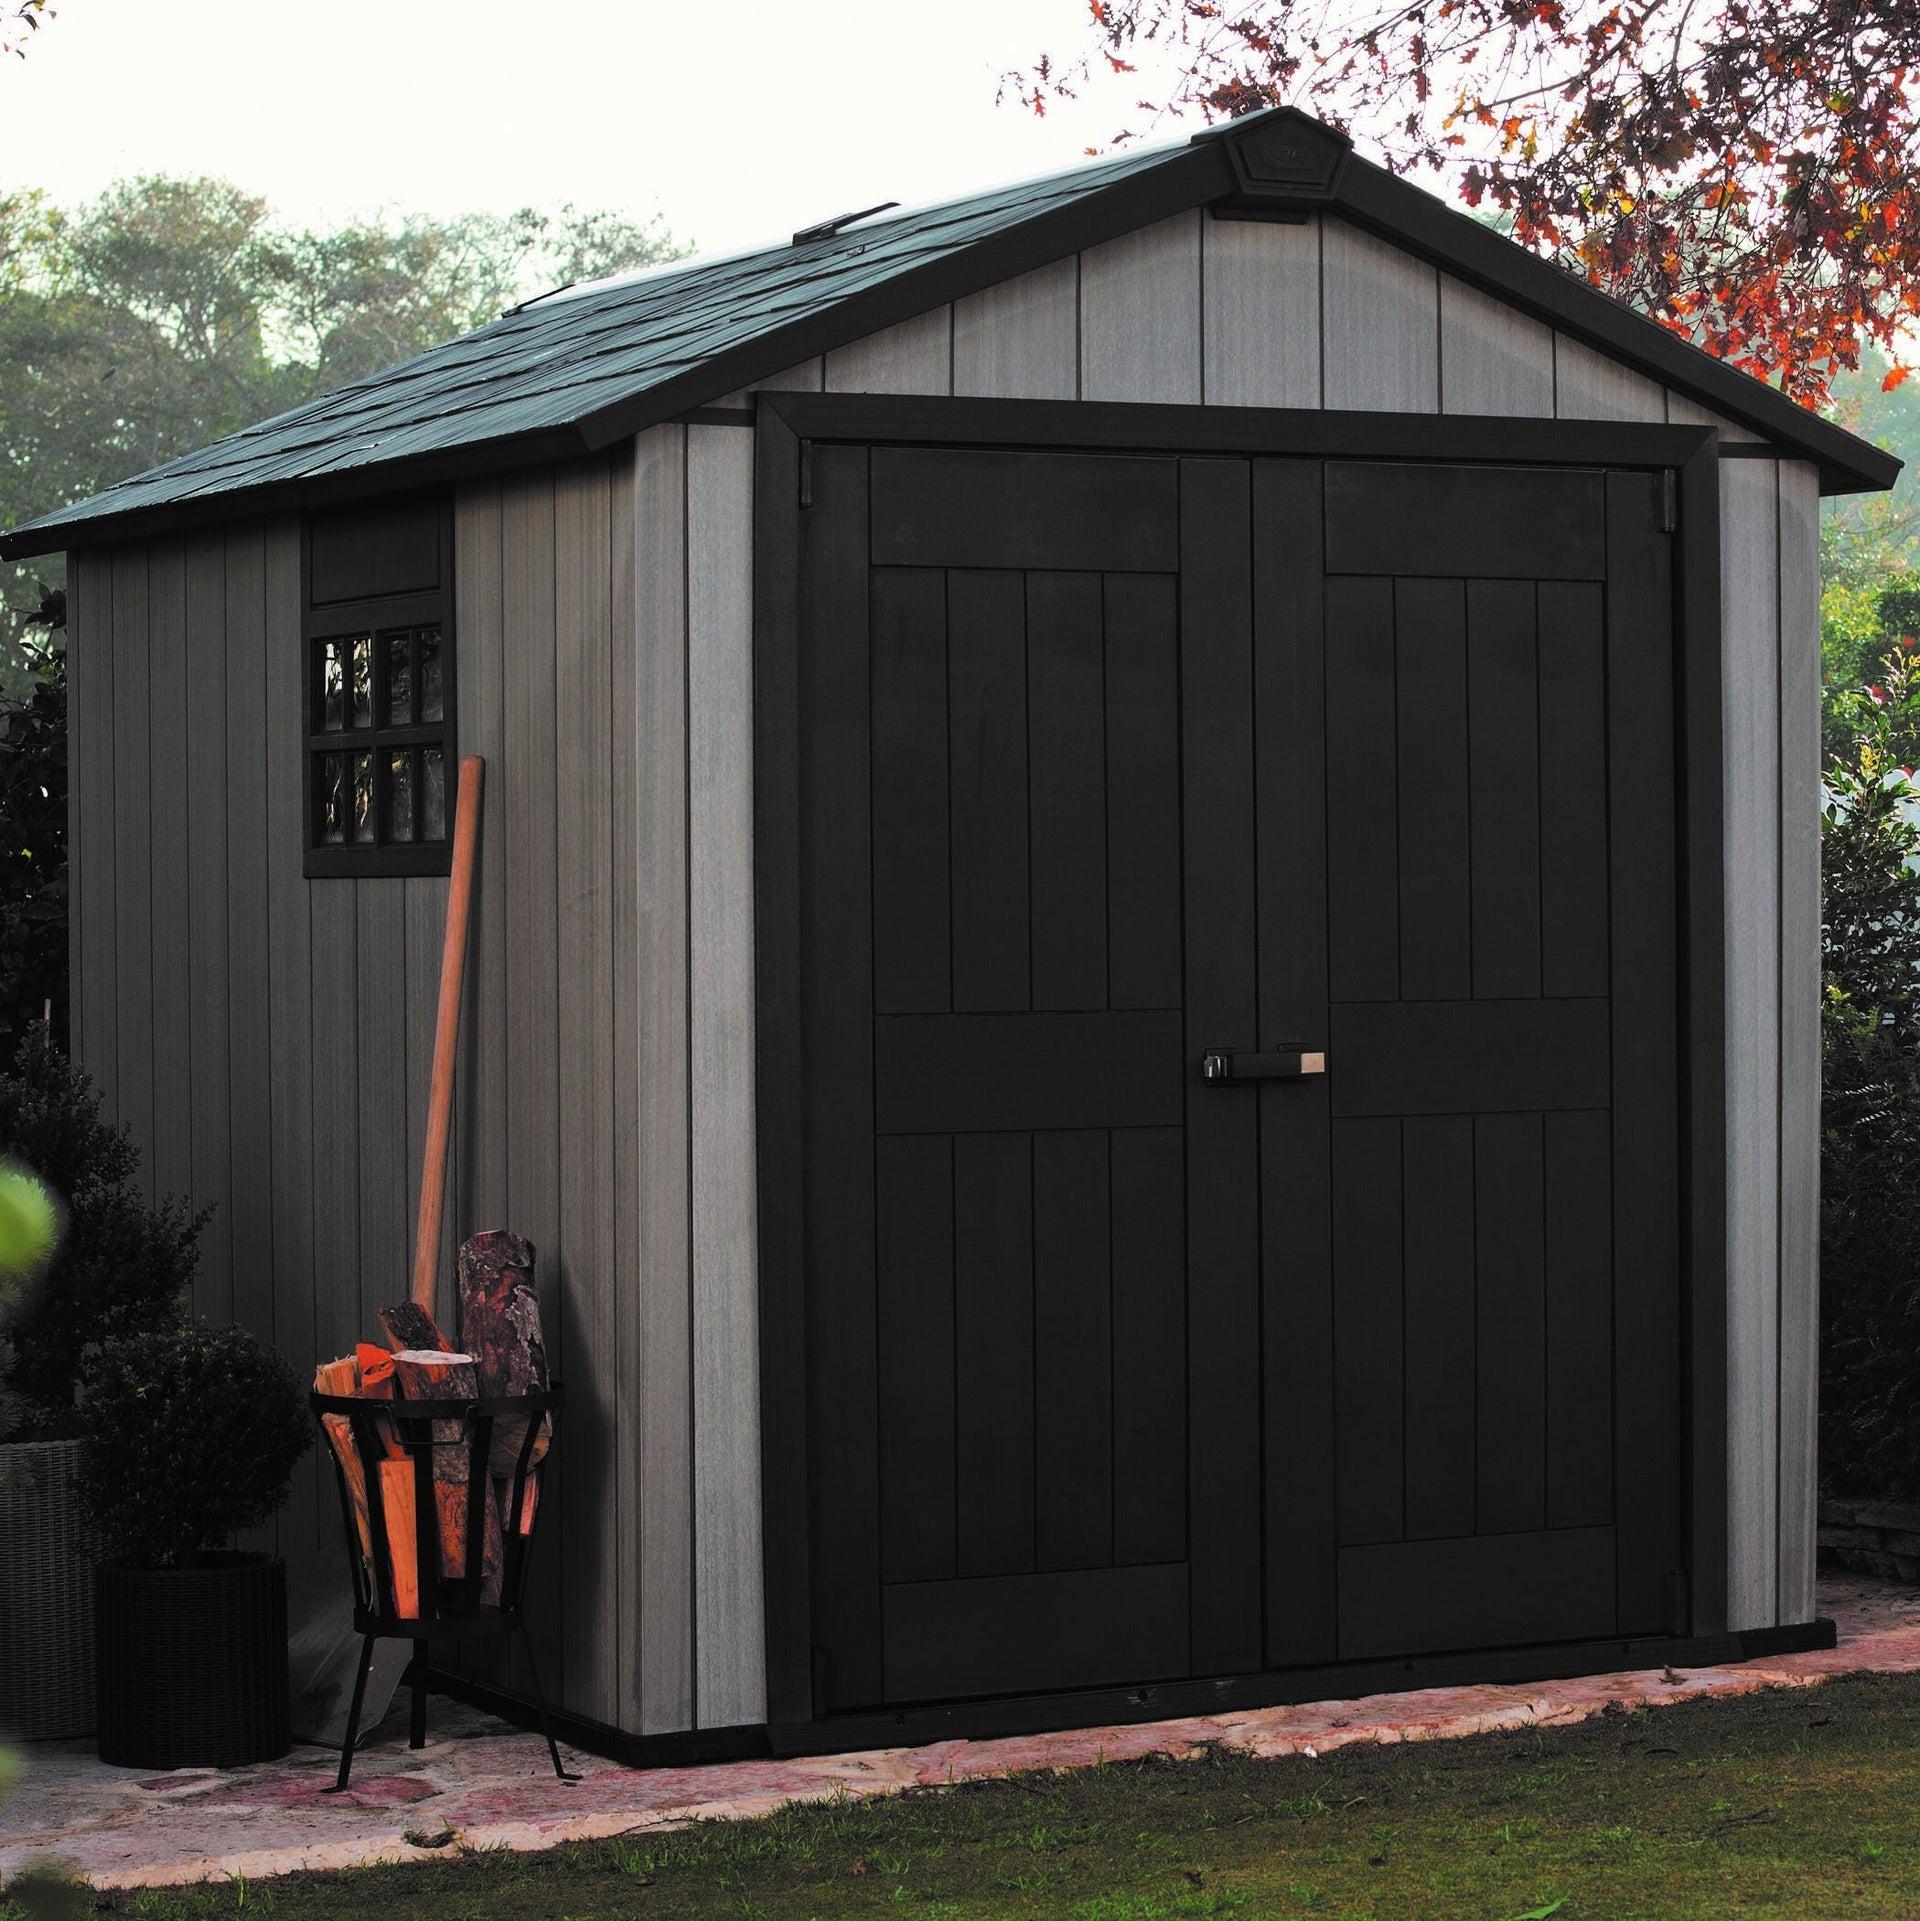 Casetta da giardino in polipropilene Oakland 759 KETER, superficie interna 5.25 m² e spessore parete 20 mm - 3